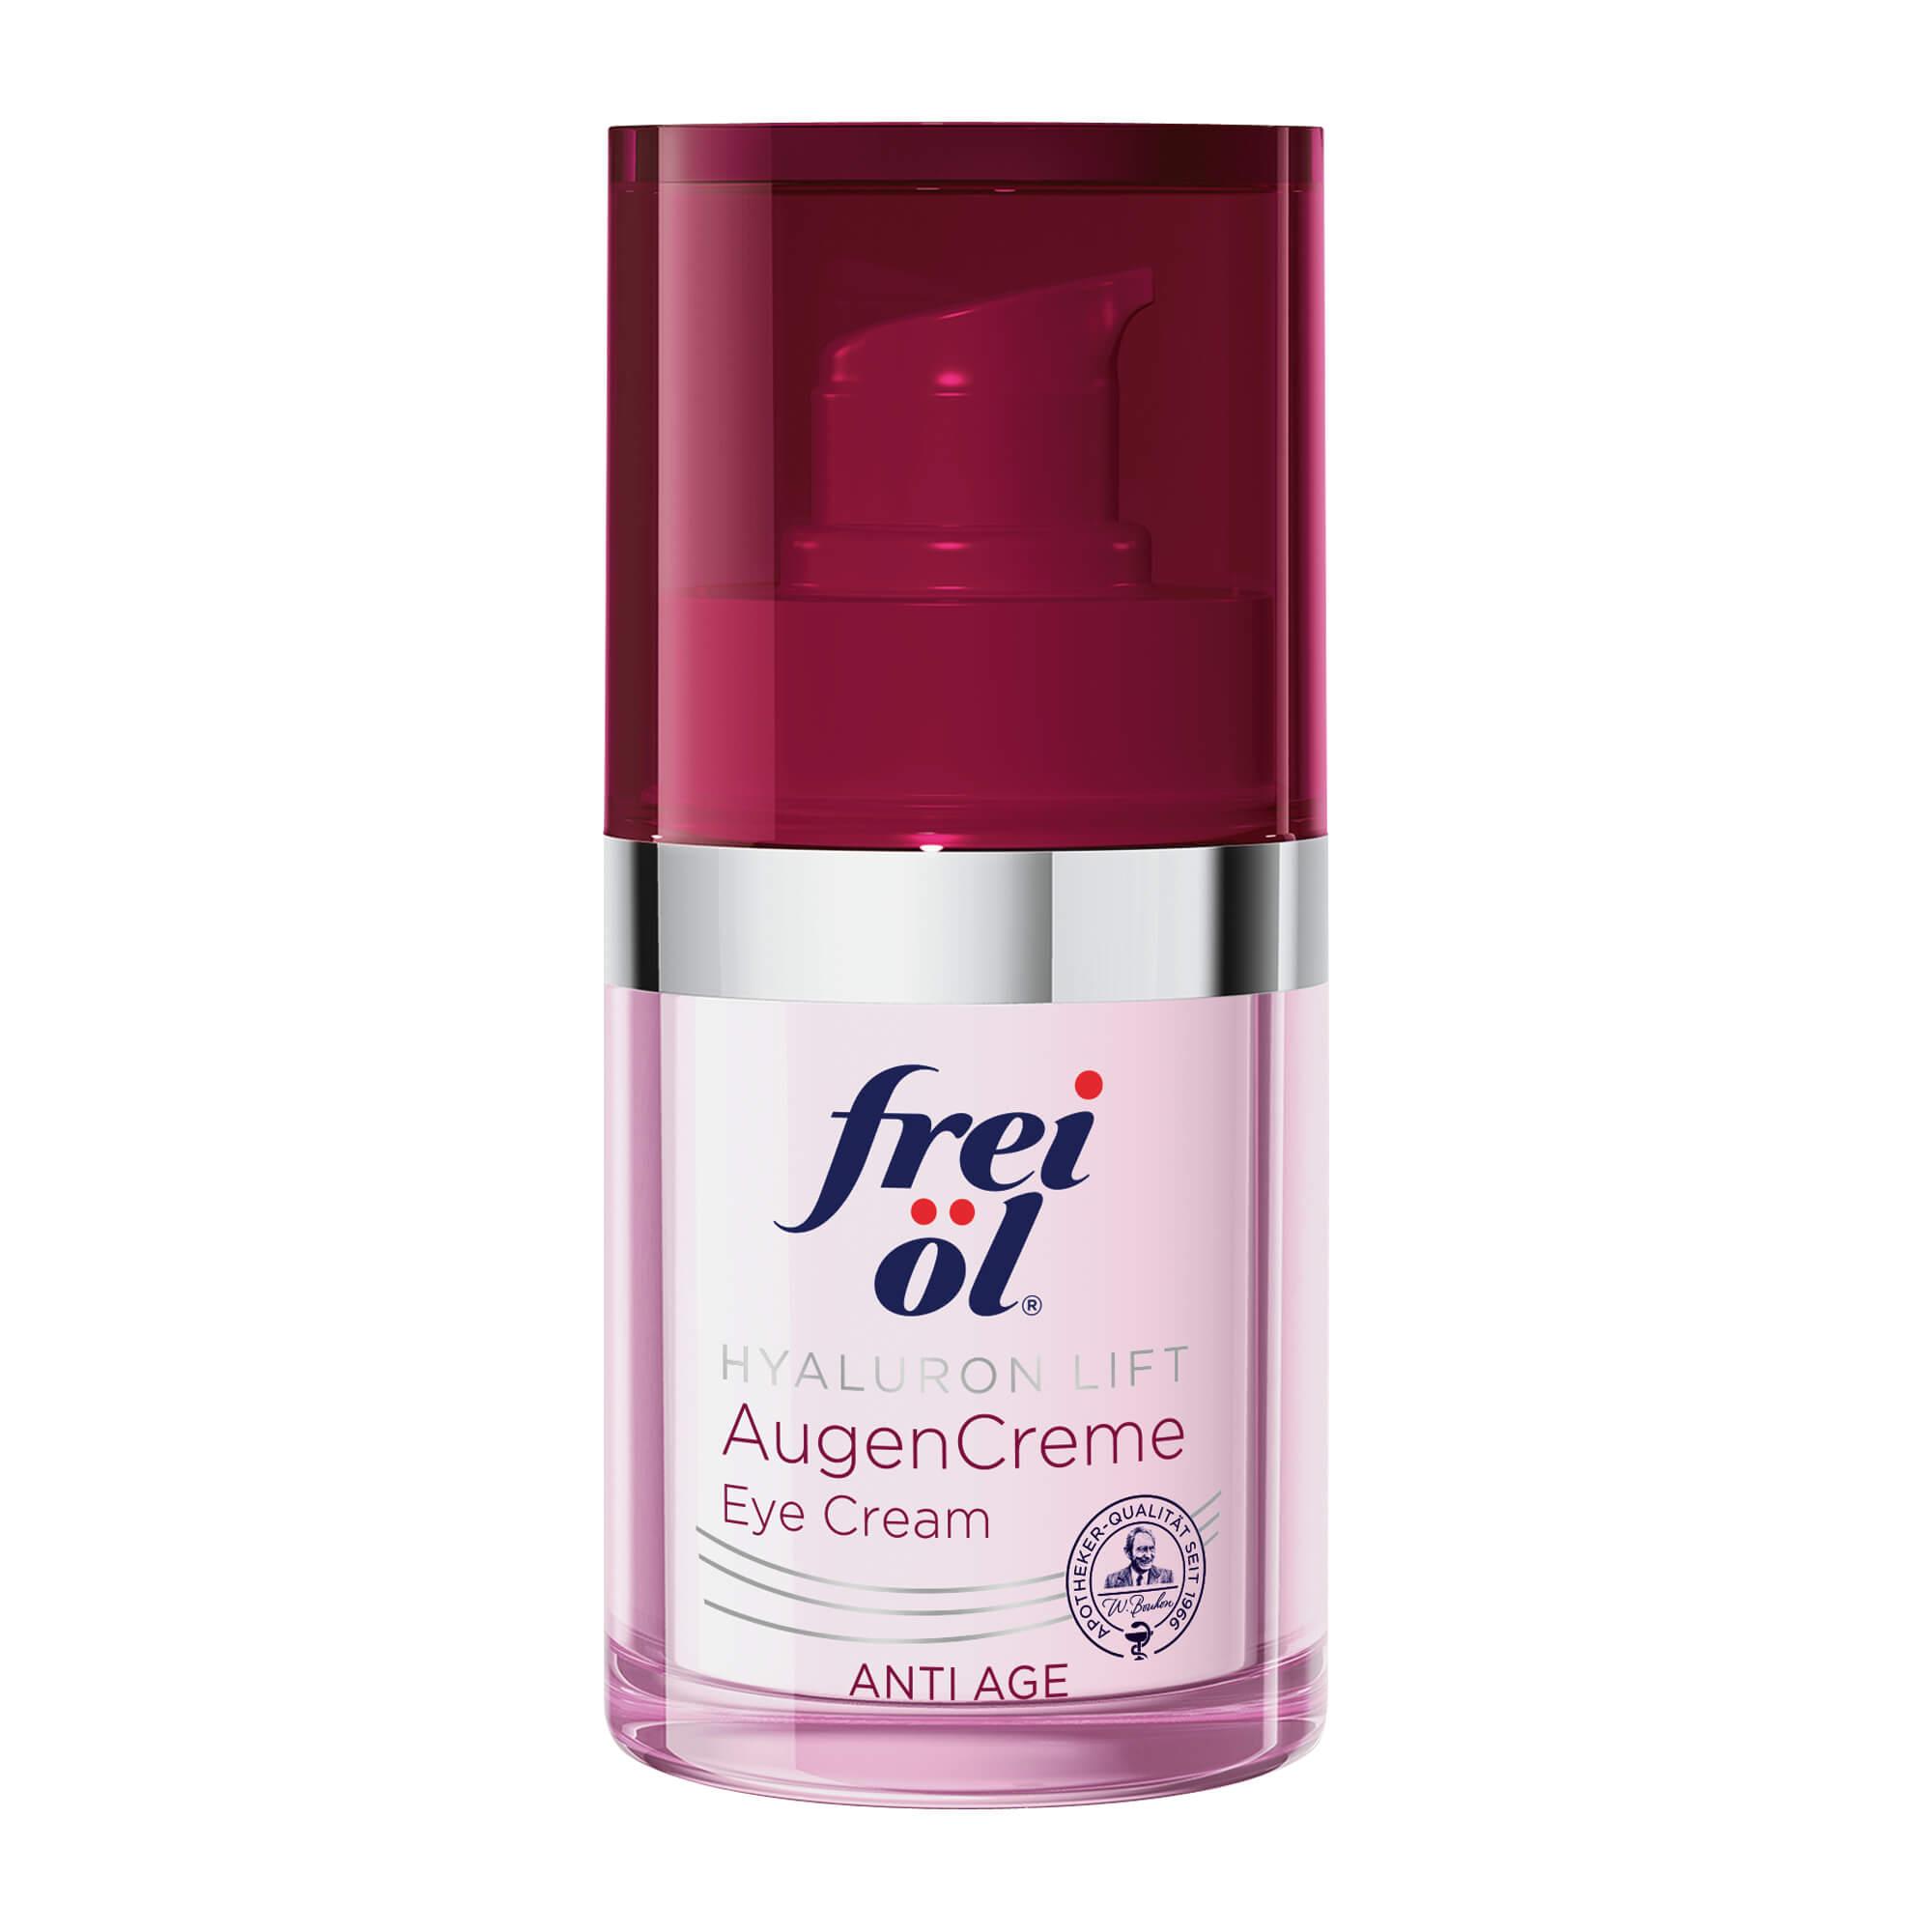 Frei Öl Anti Age Hyaluron Lift AugenCreme